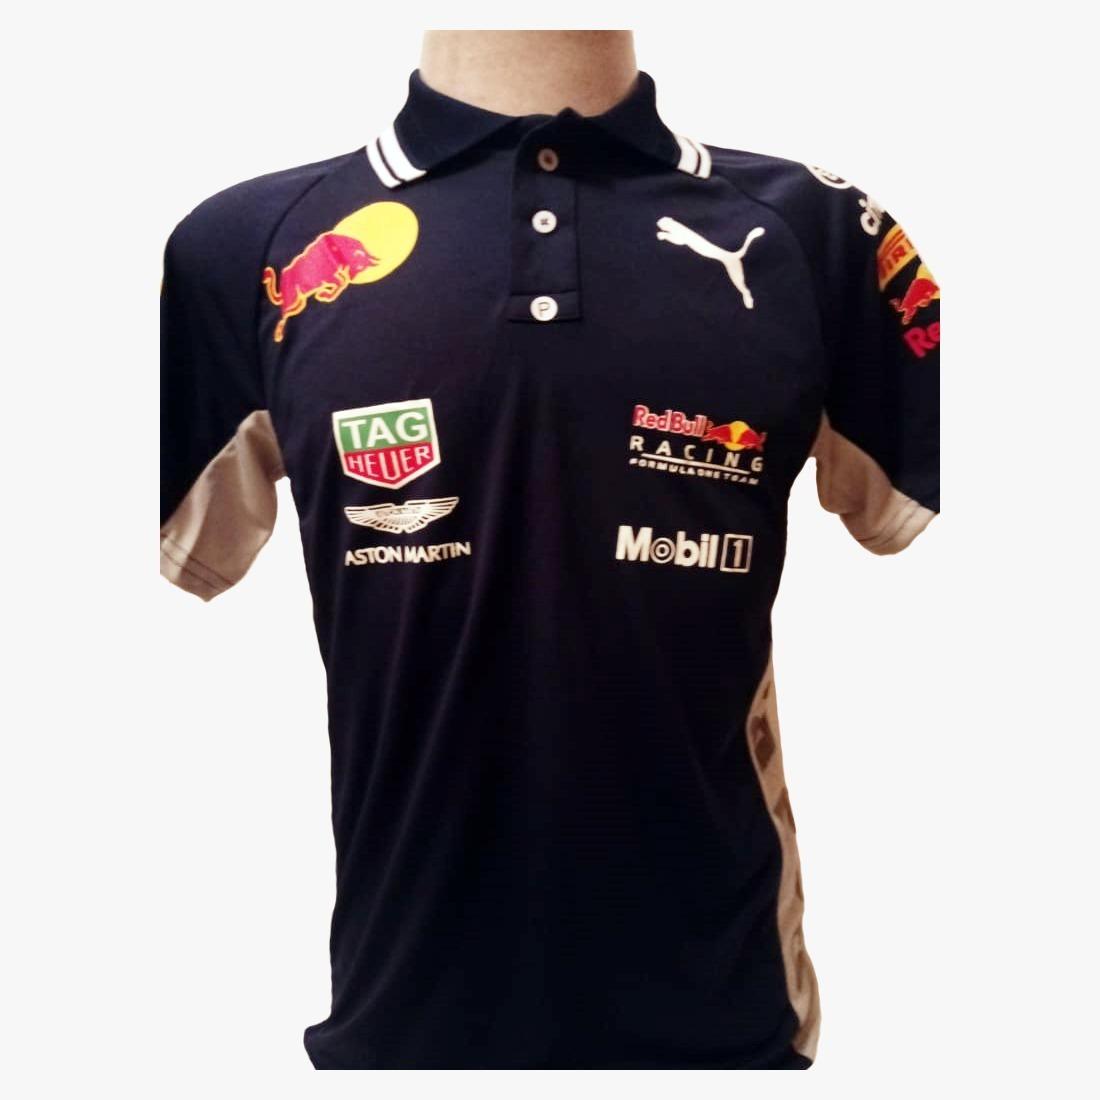 camisa camiseta polo formula 1 f1 red bull corrida. Carregando zoom. c350a85f8d3